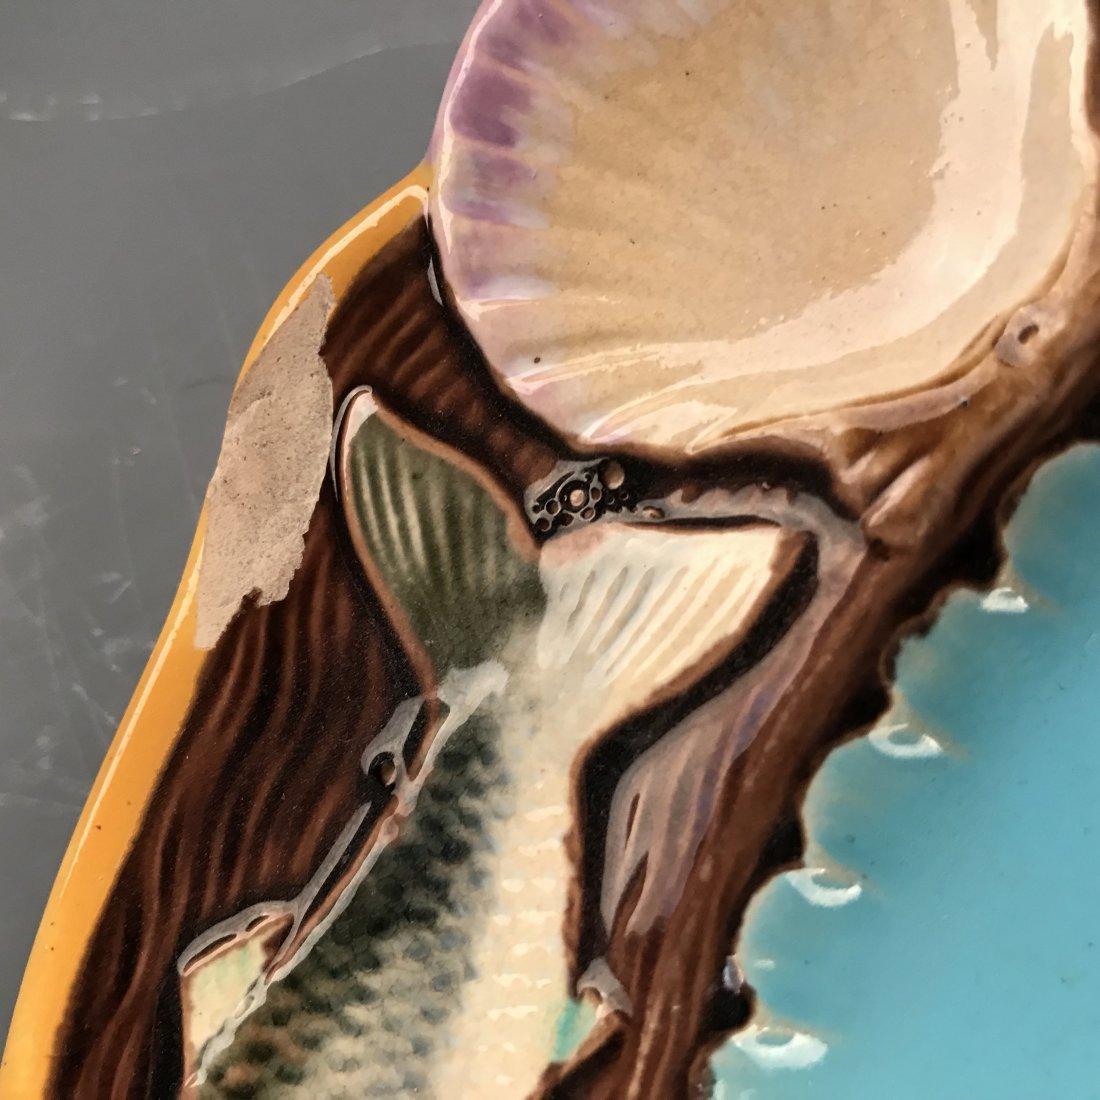 8 Minton Majolica Plates, Fish Design - 7